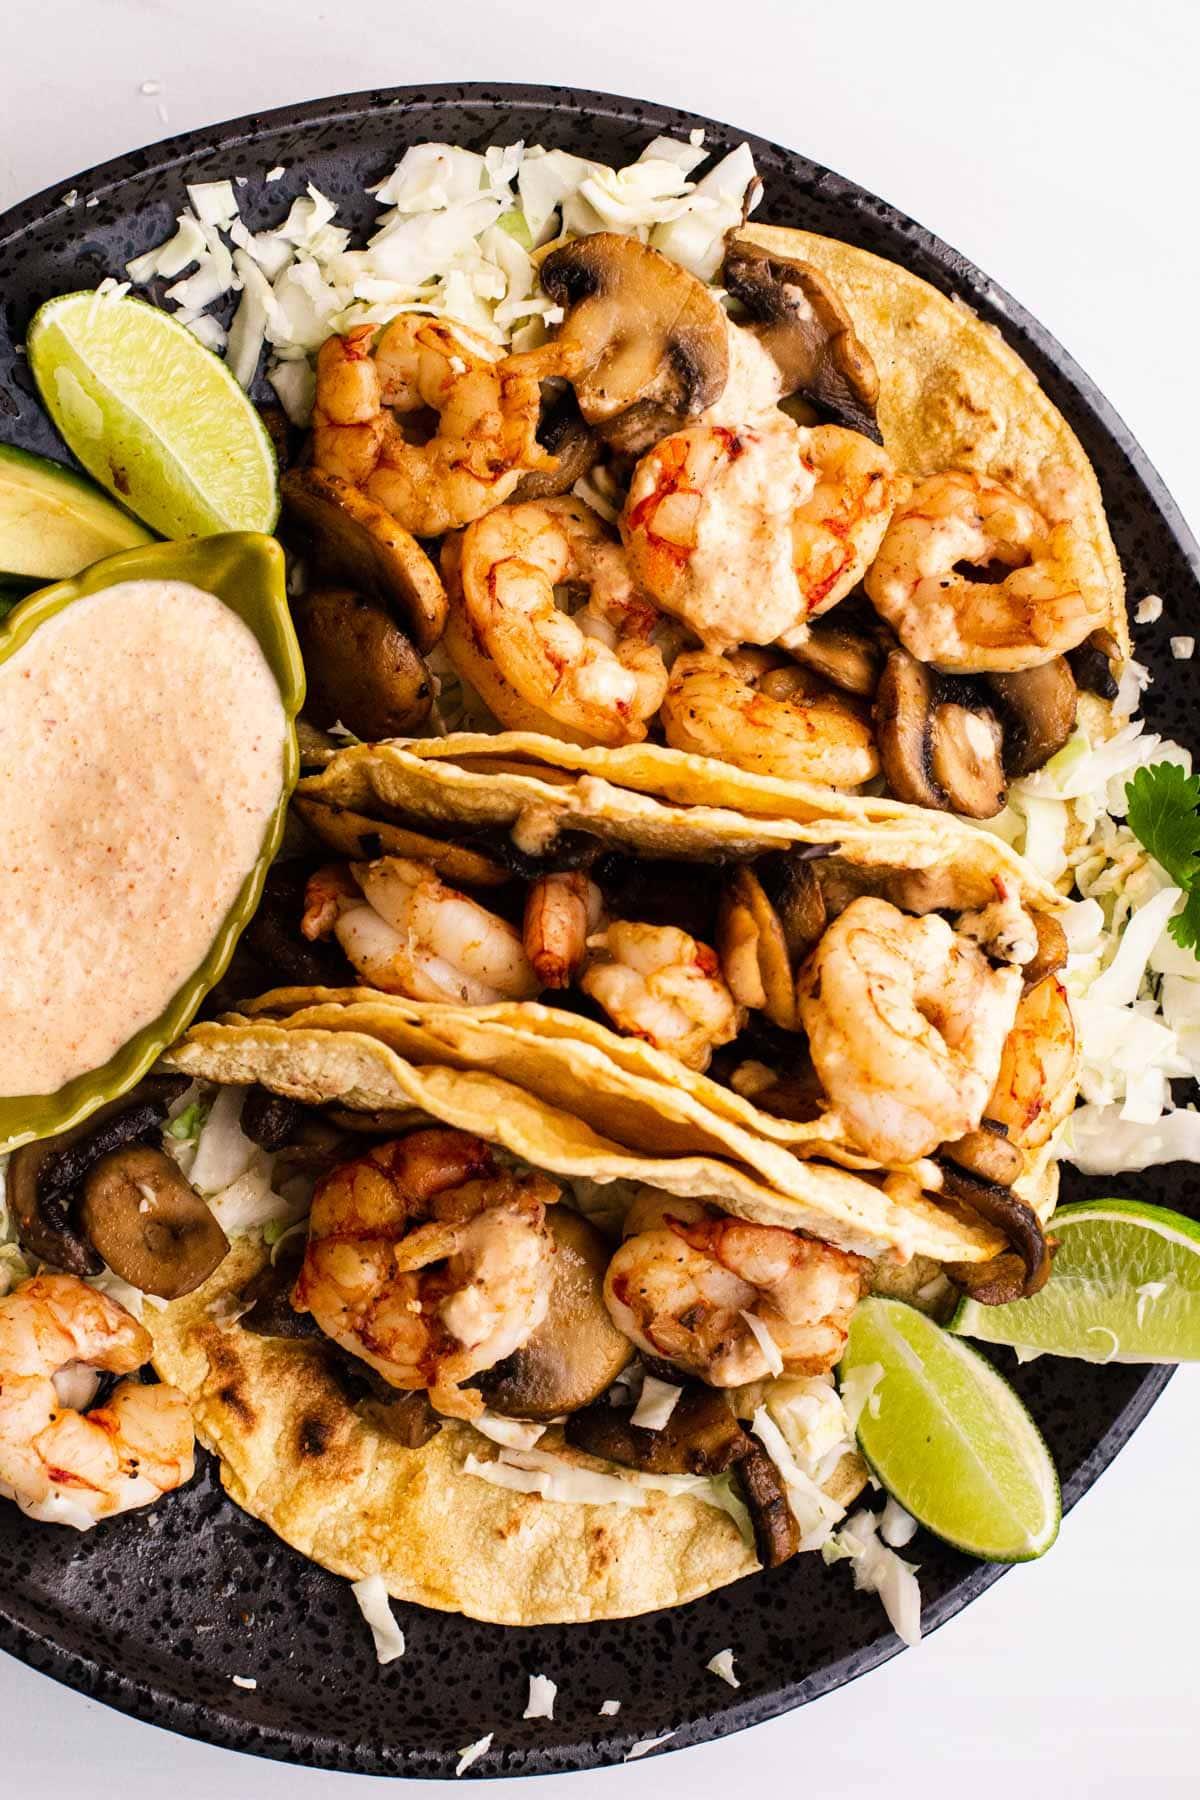 simple shrimp and mushroom tacos on corn tortillas with a creamy pineapple salsa.